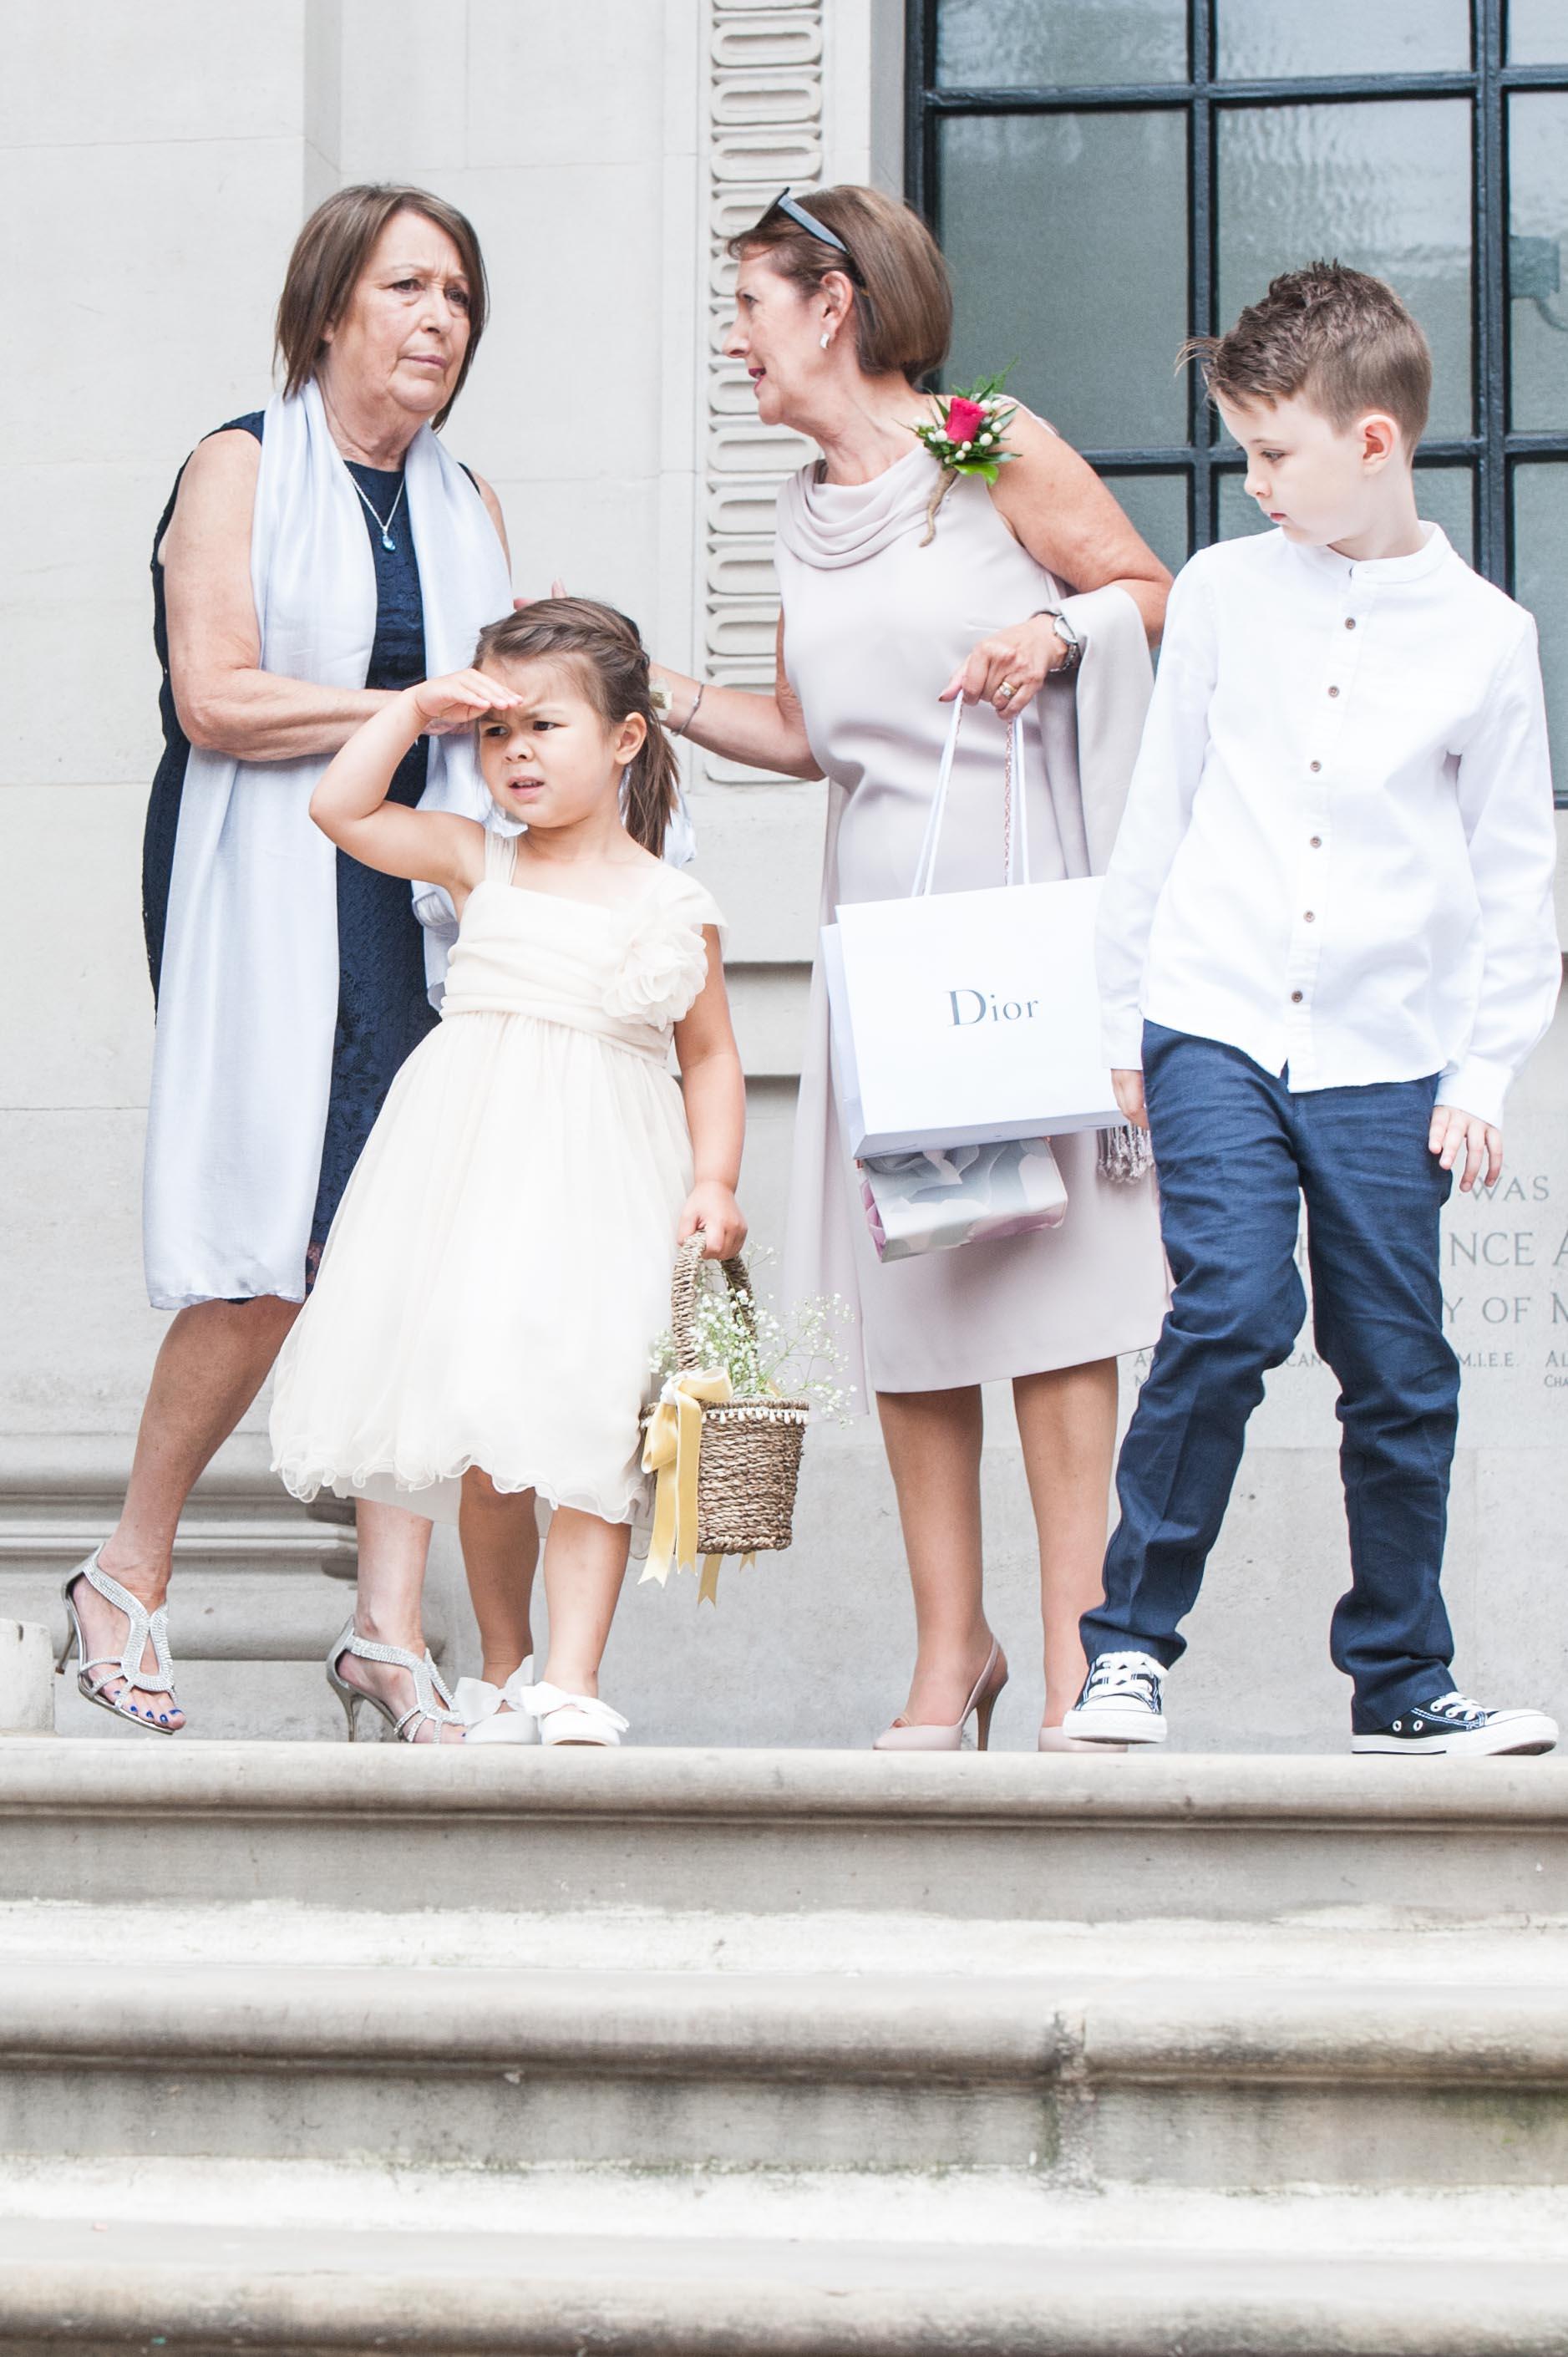 D&M_Marylebone Town Hall Wedding (51 of 239).jpg